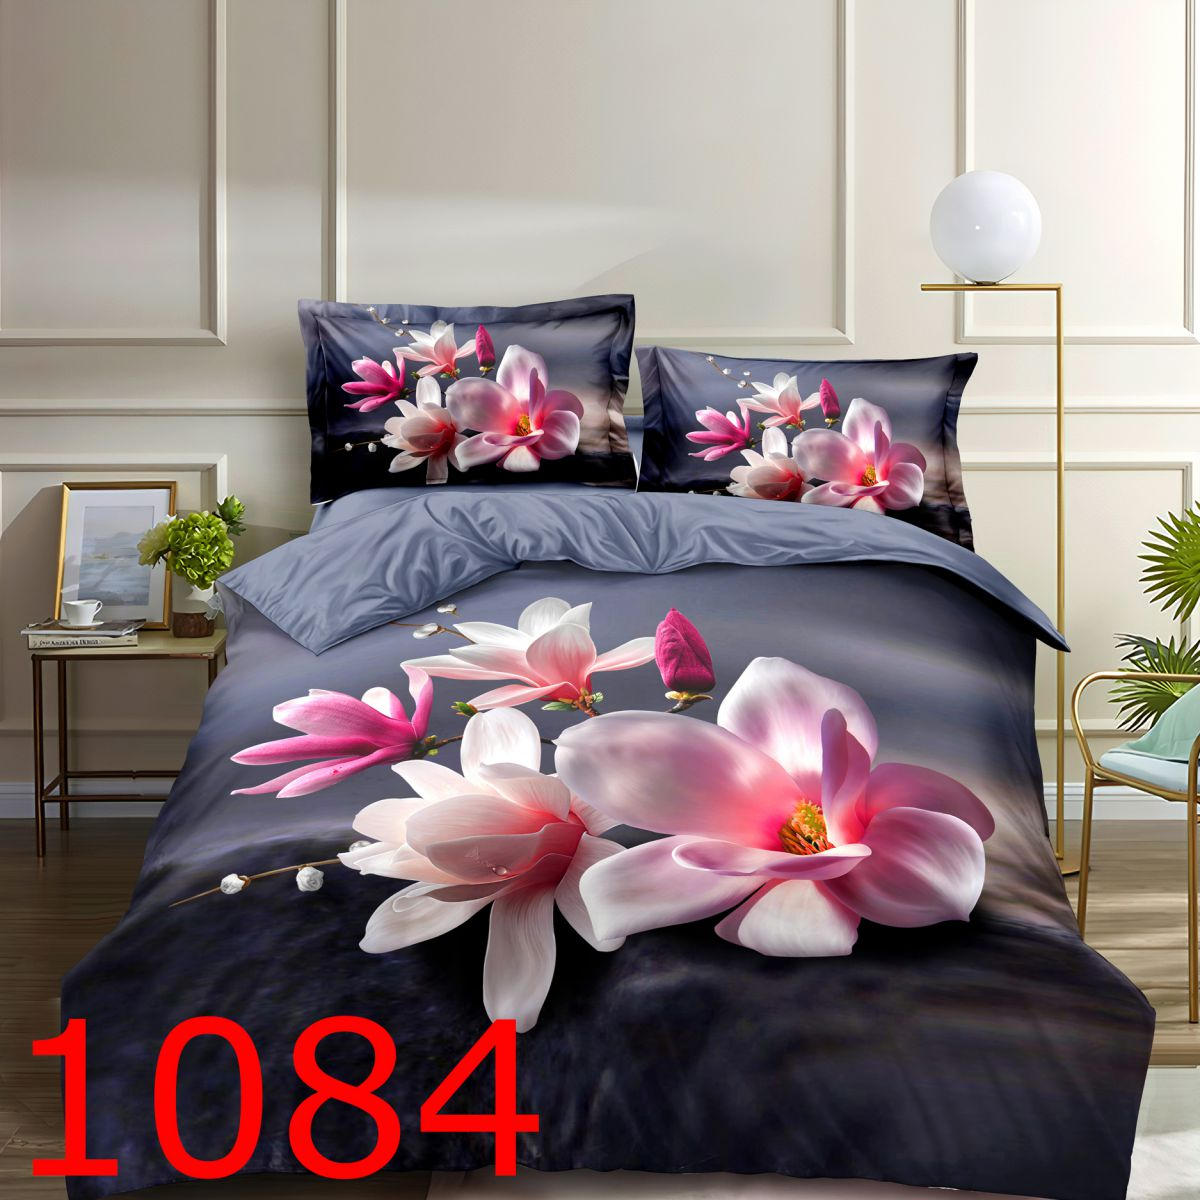 3D Beddings - Antonio - AML-4254 - 160x200 cm - 3 pcs